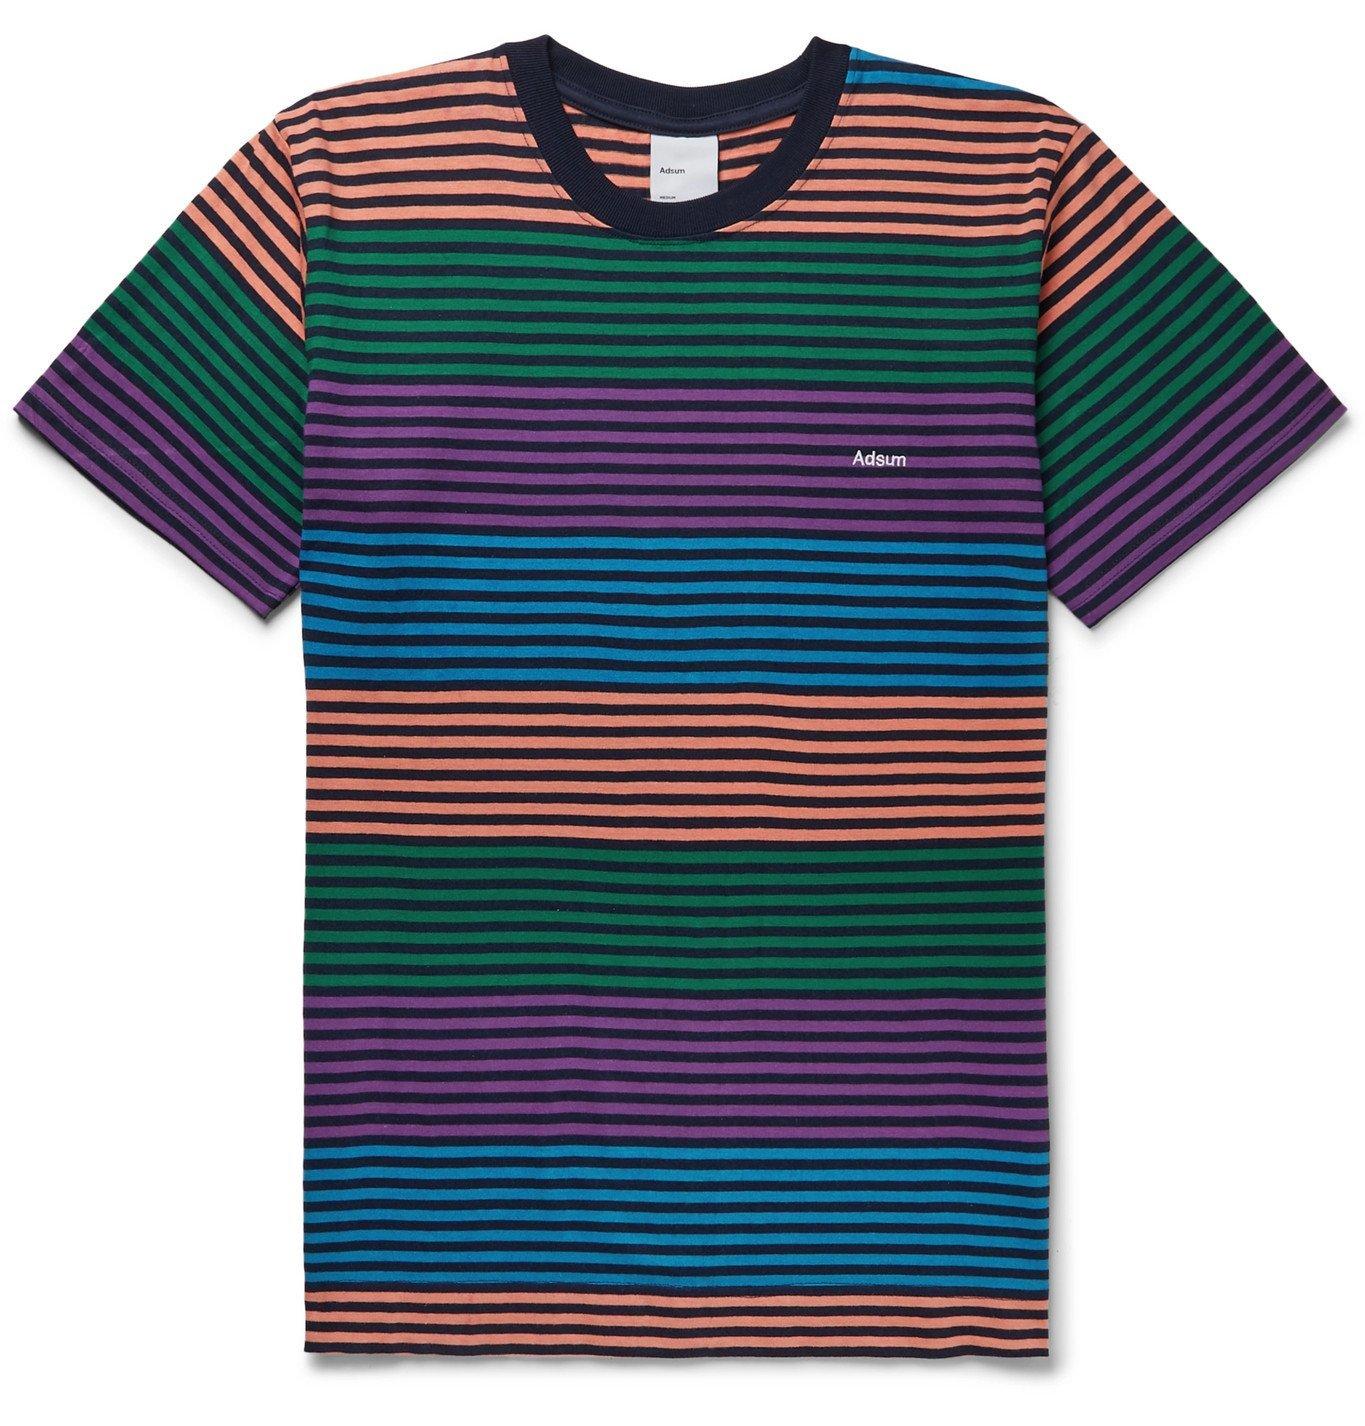 Adsum - Candy Logo-Embroidered Striped Cotton-Jersey T-Shirt - Multi